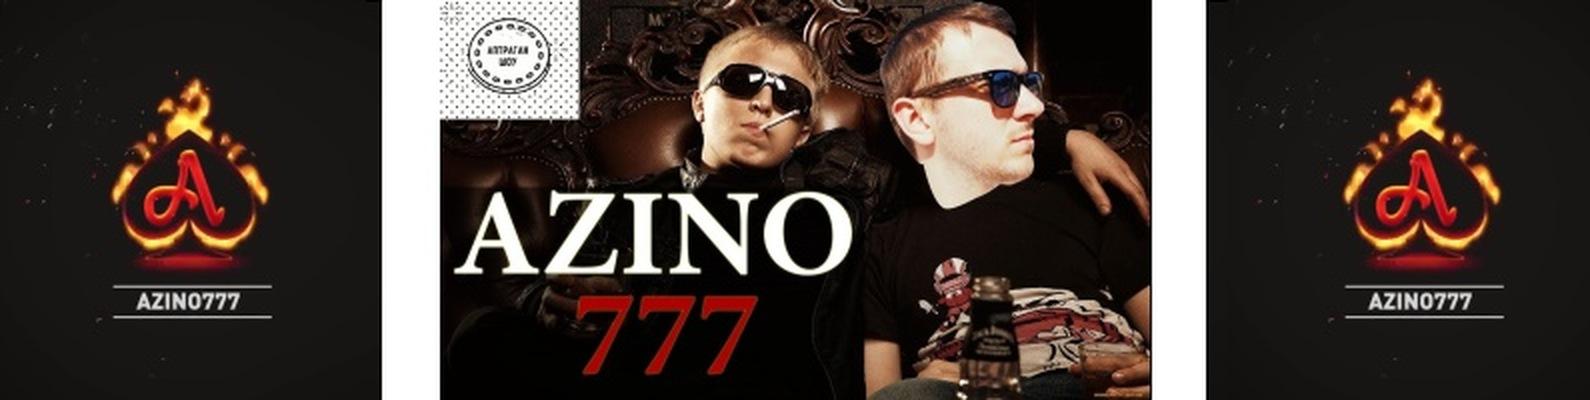 2009 azino777